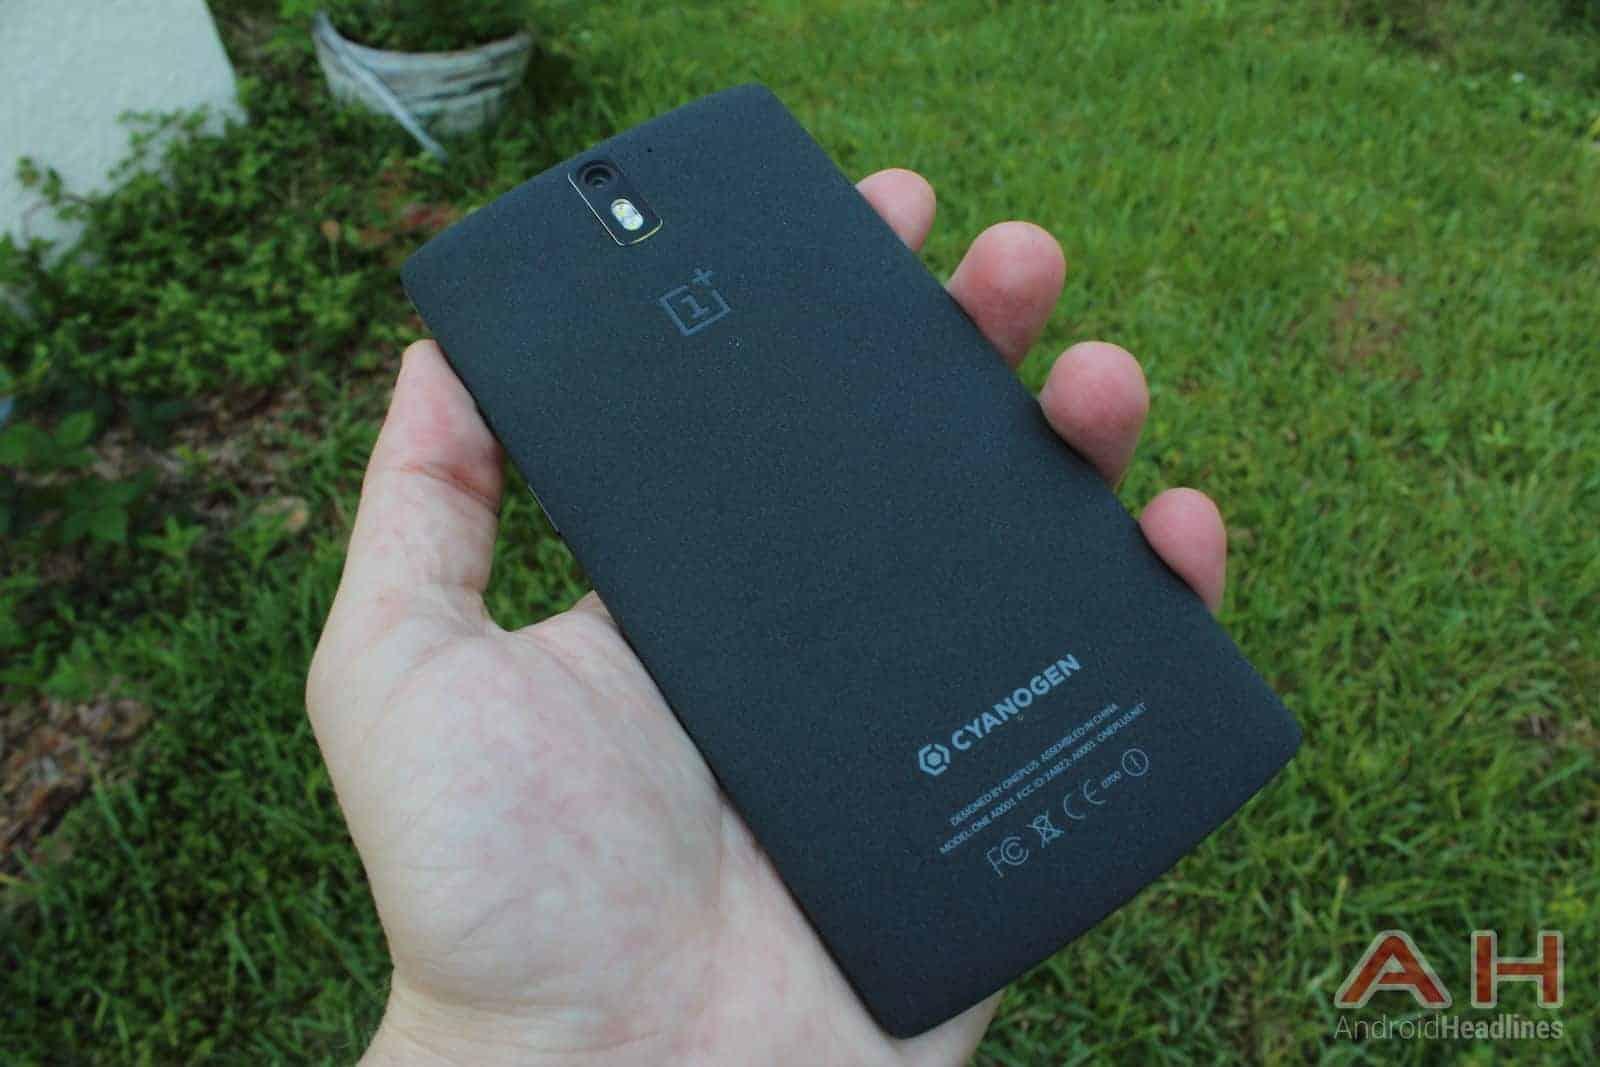 OnePlus-One-holding-back